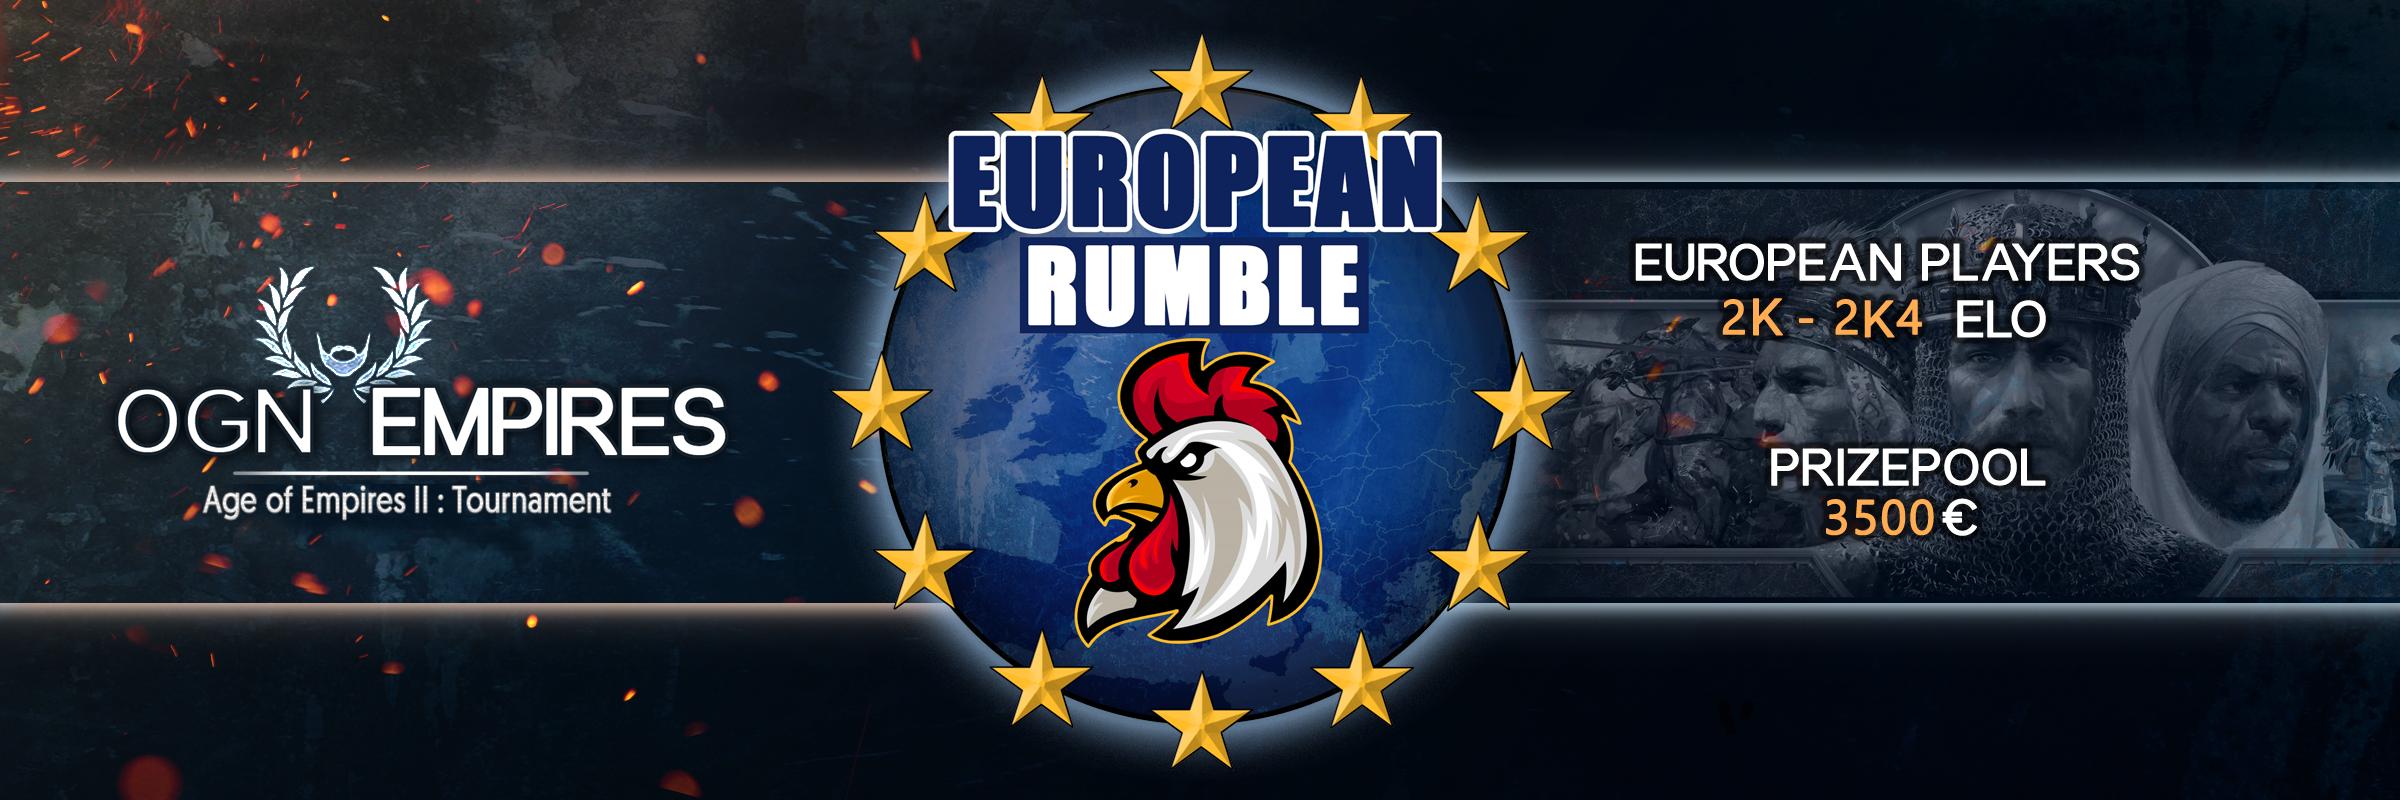 european_rumble.png